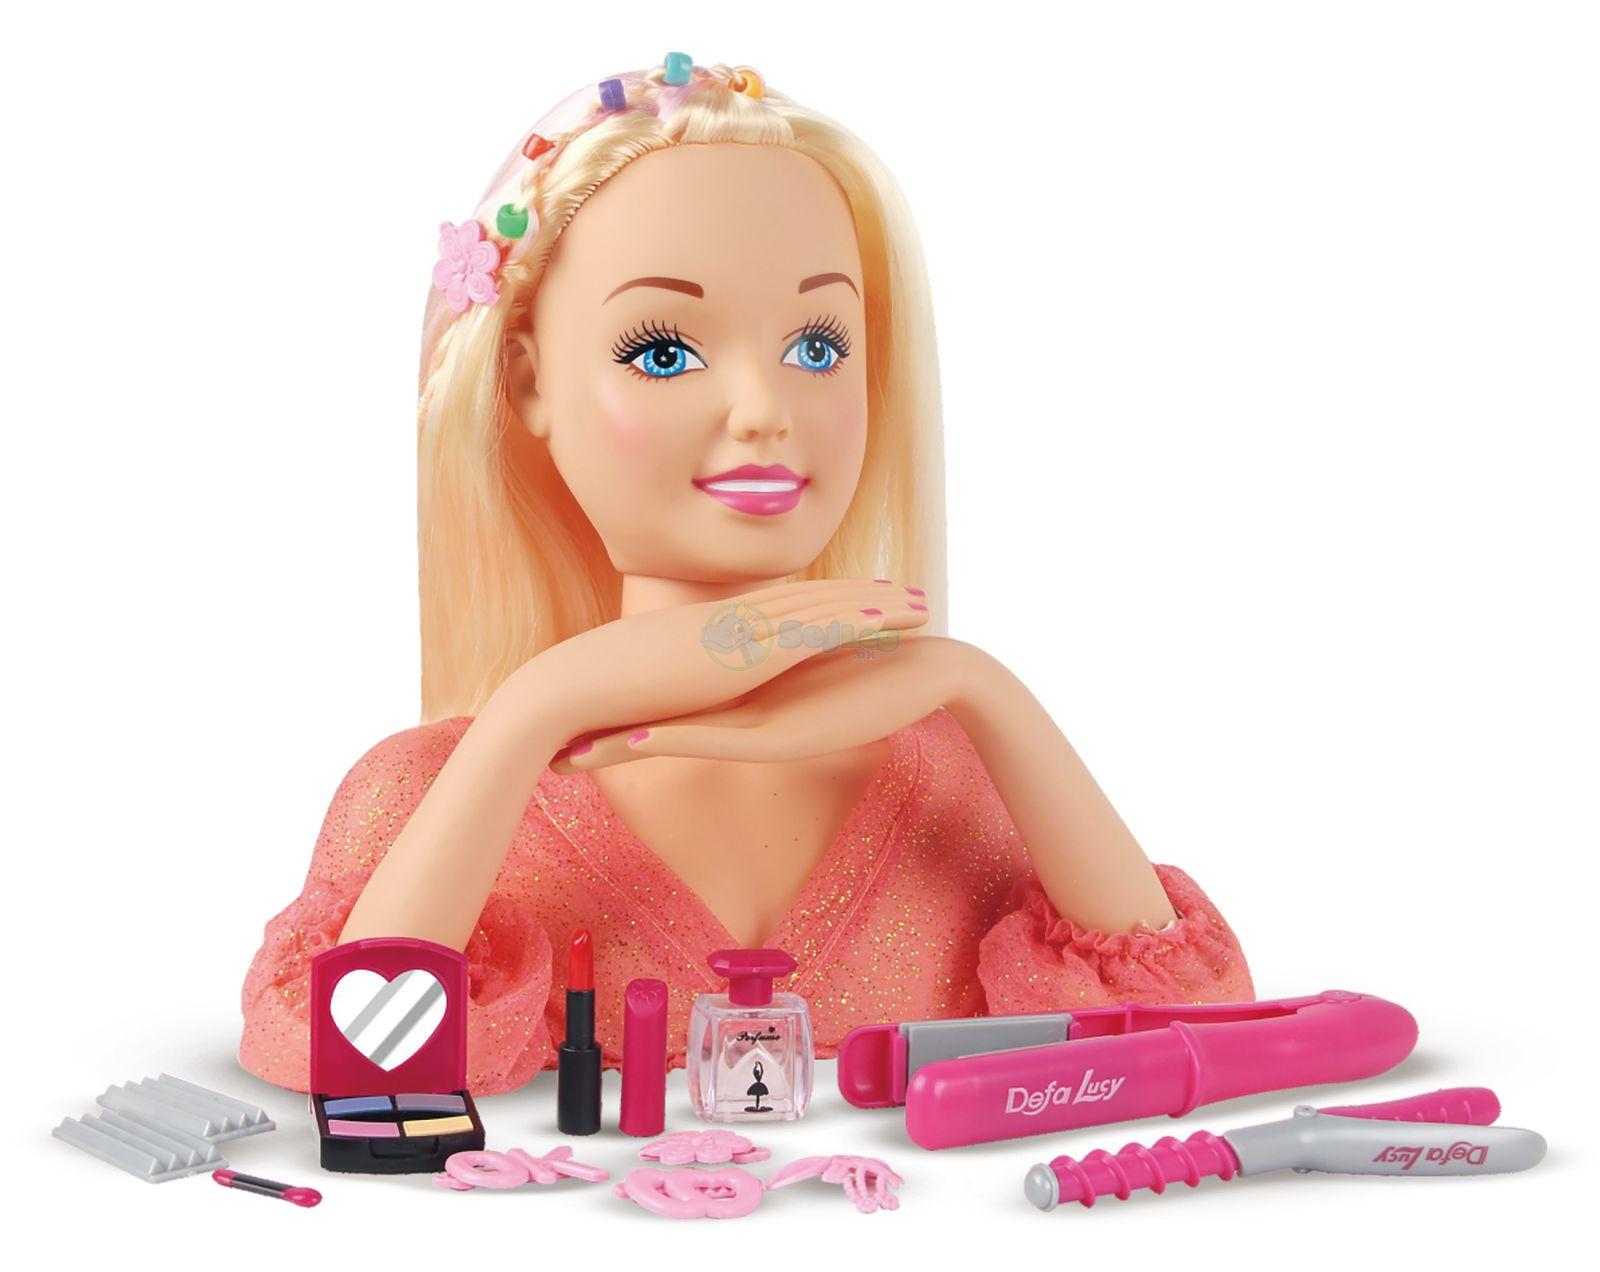 Judith - Make-Up Styling Dollhead (61190)